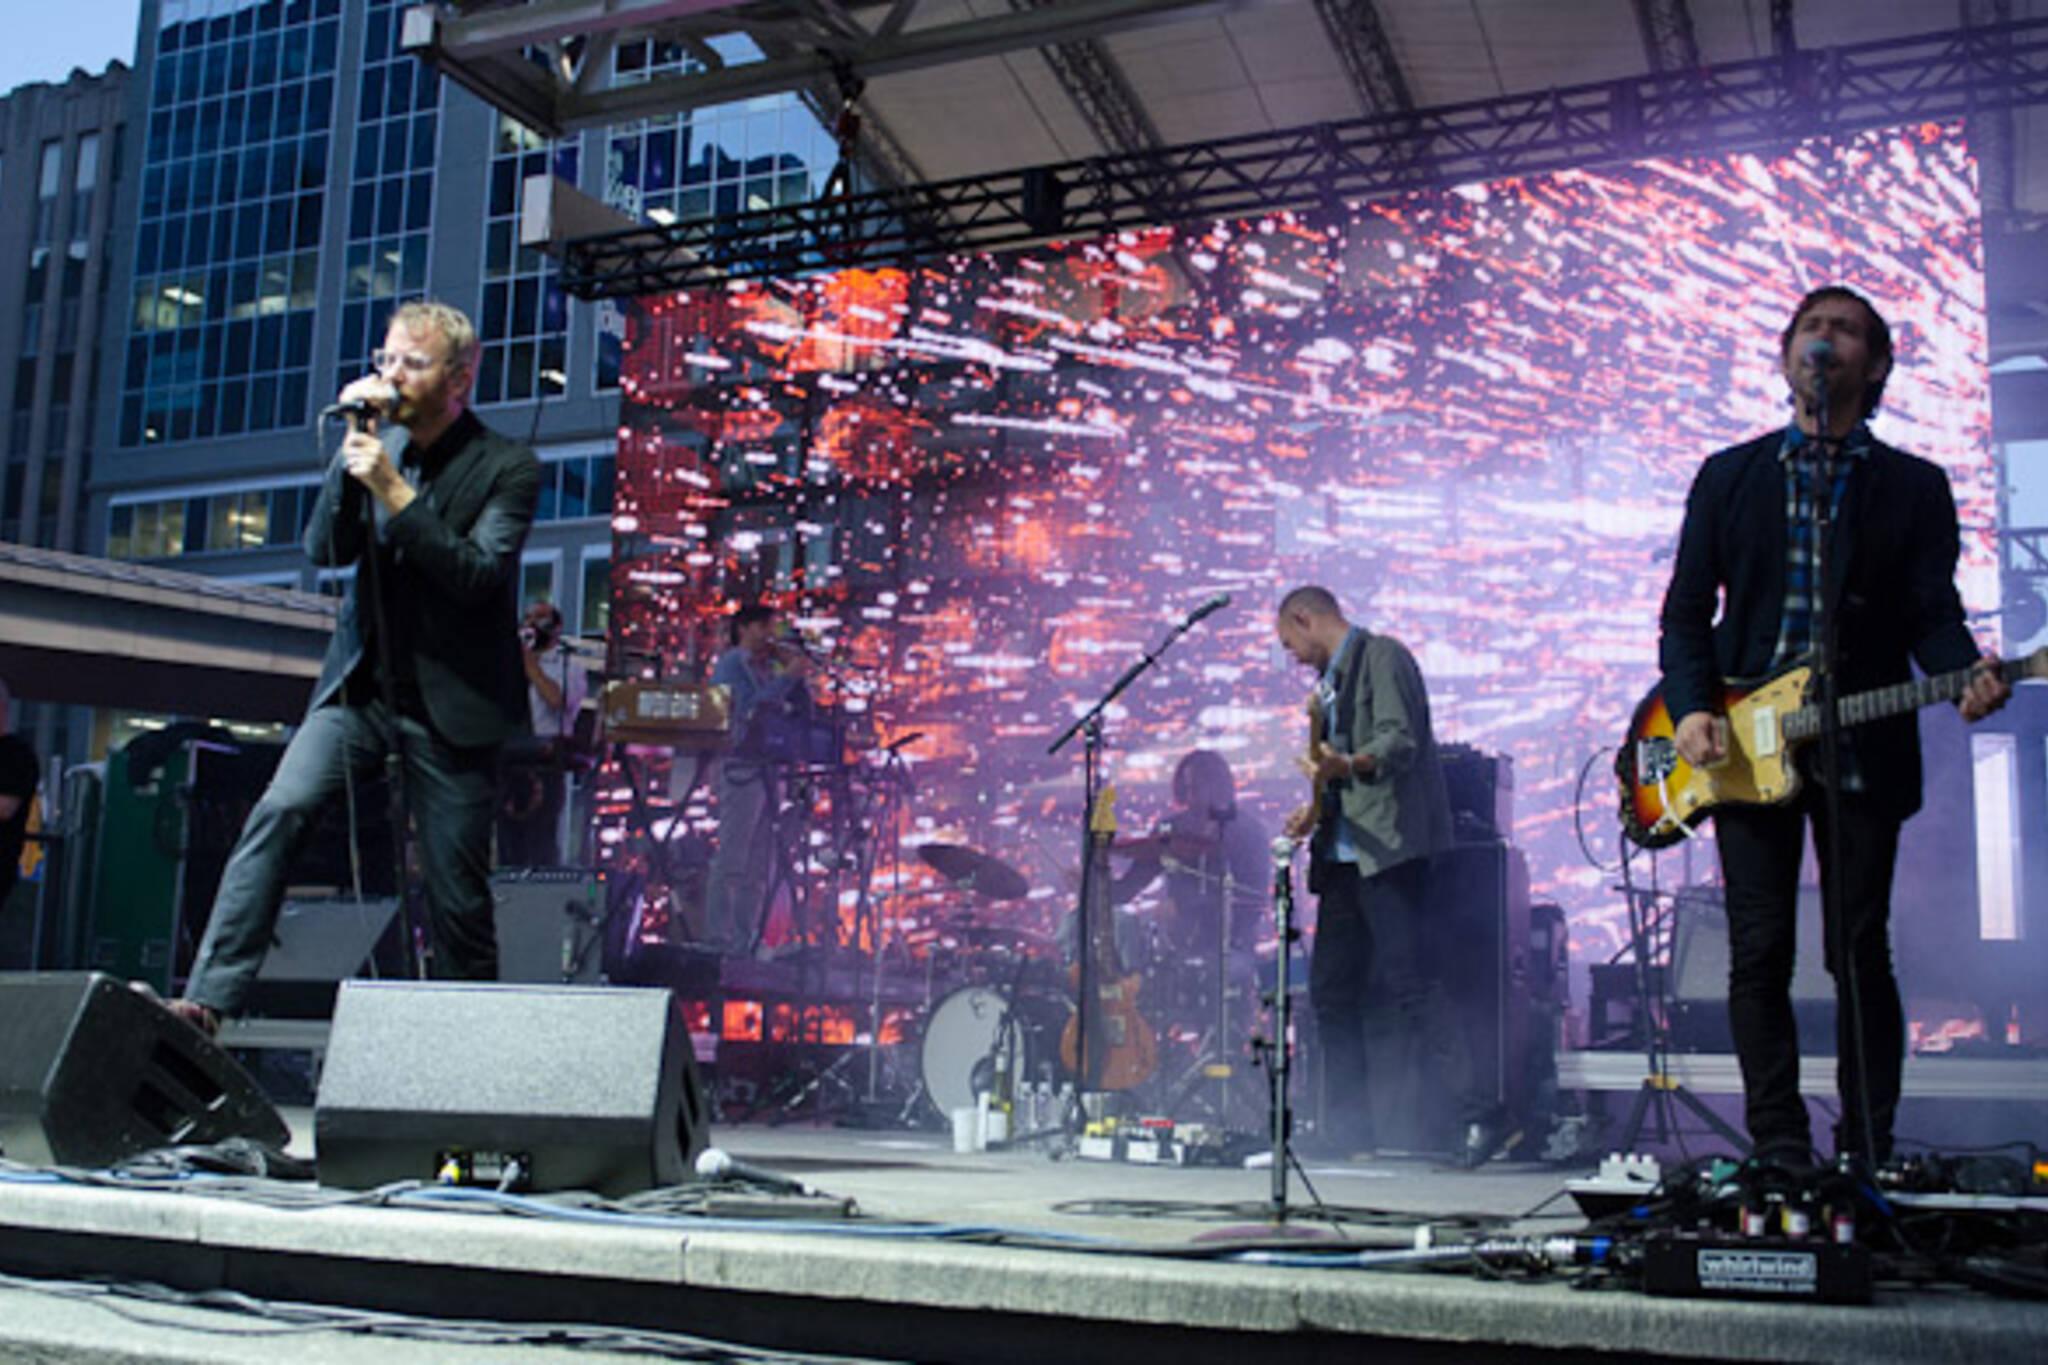 The National Live Toronto